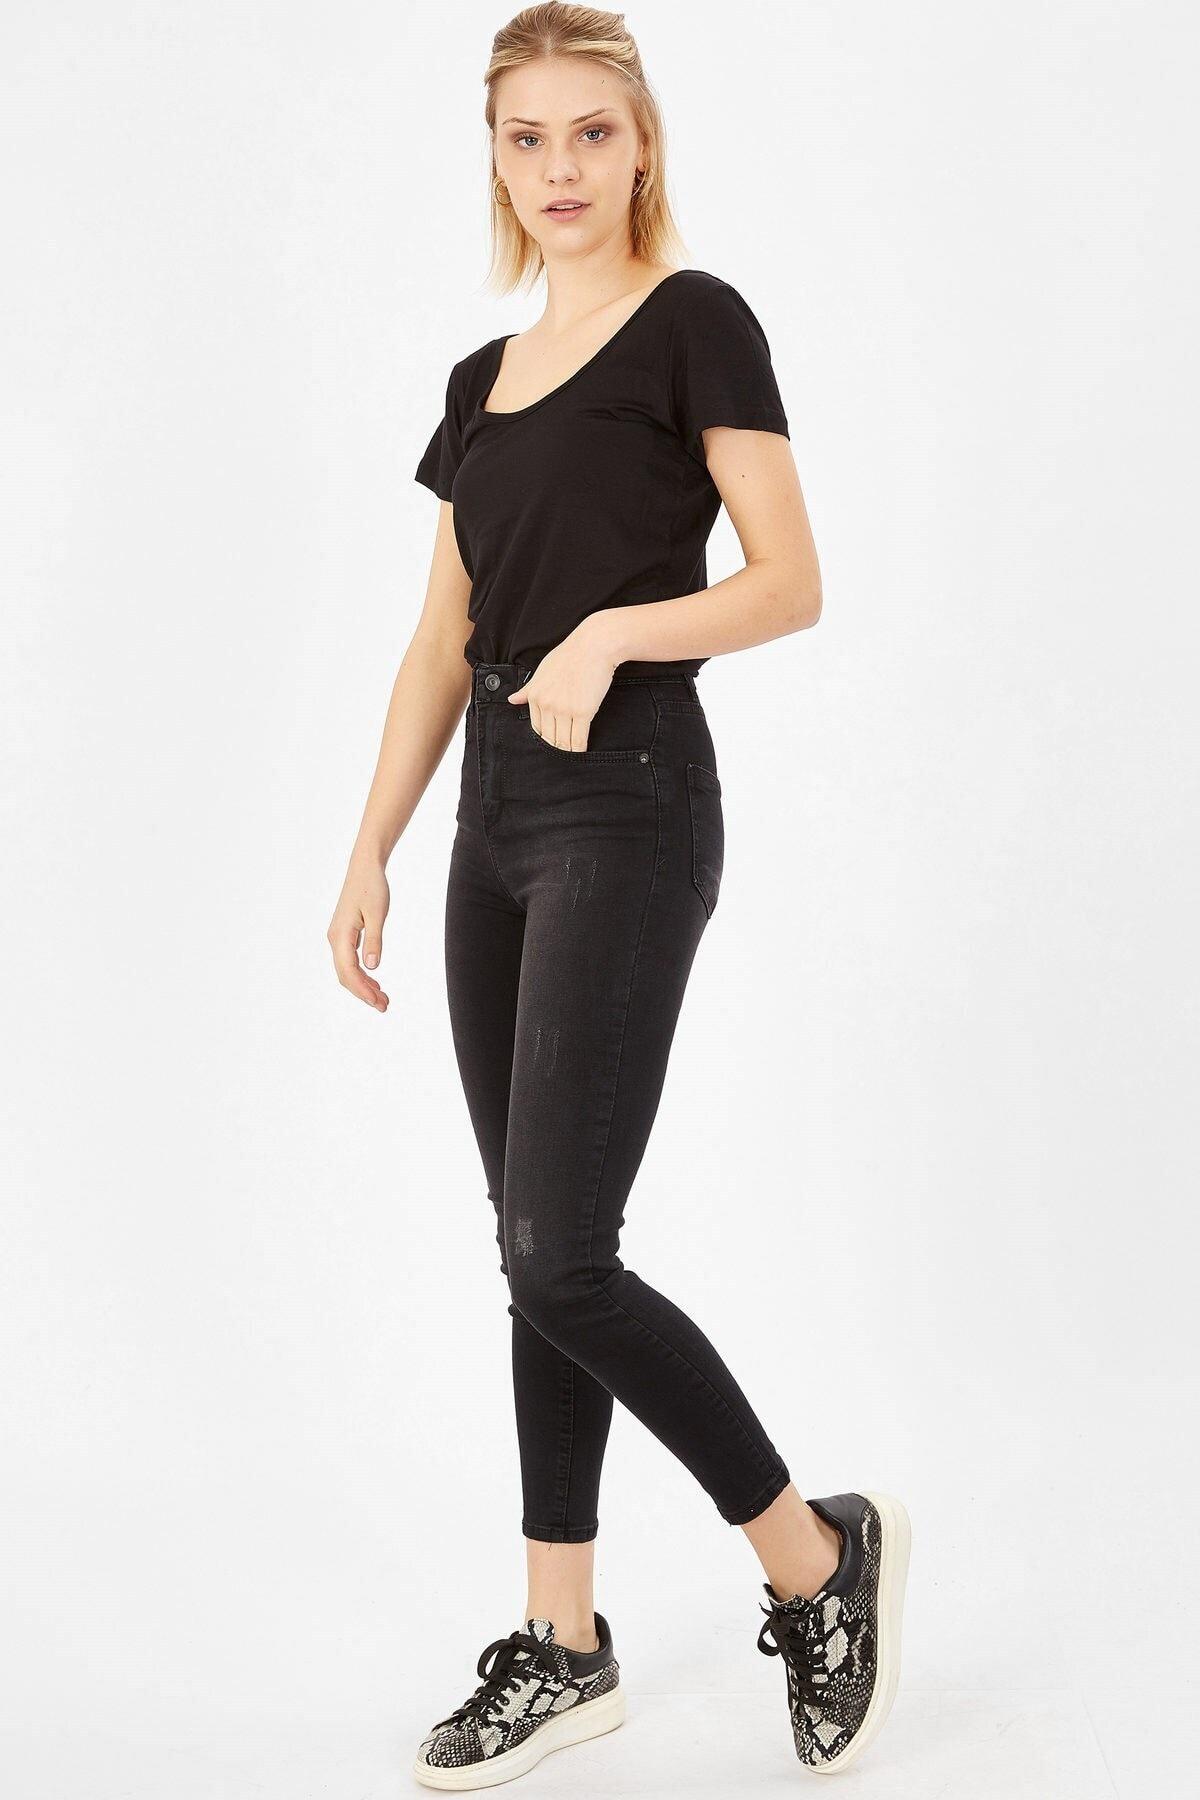 Arma Life Taşlanmış Lazerli Yüksek Bel Likralı Pantolon - Taşlanmış Siyah 2